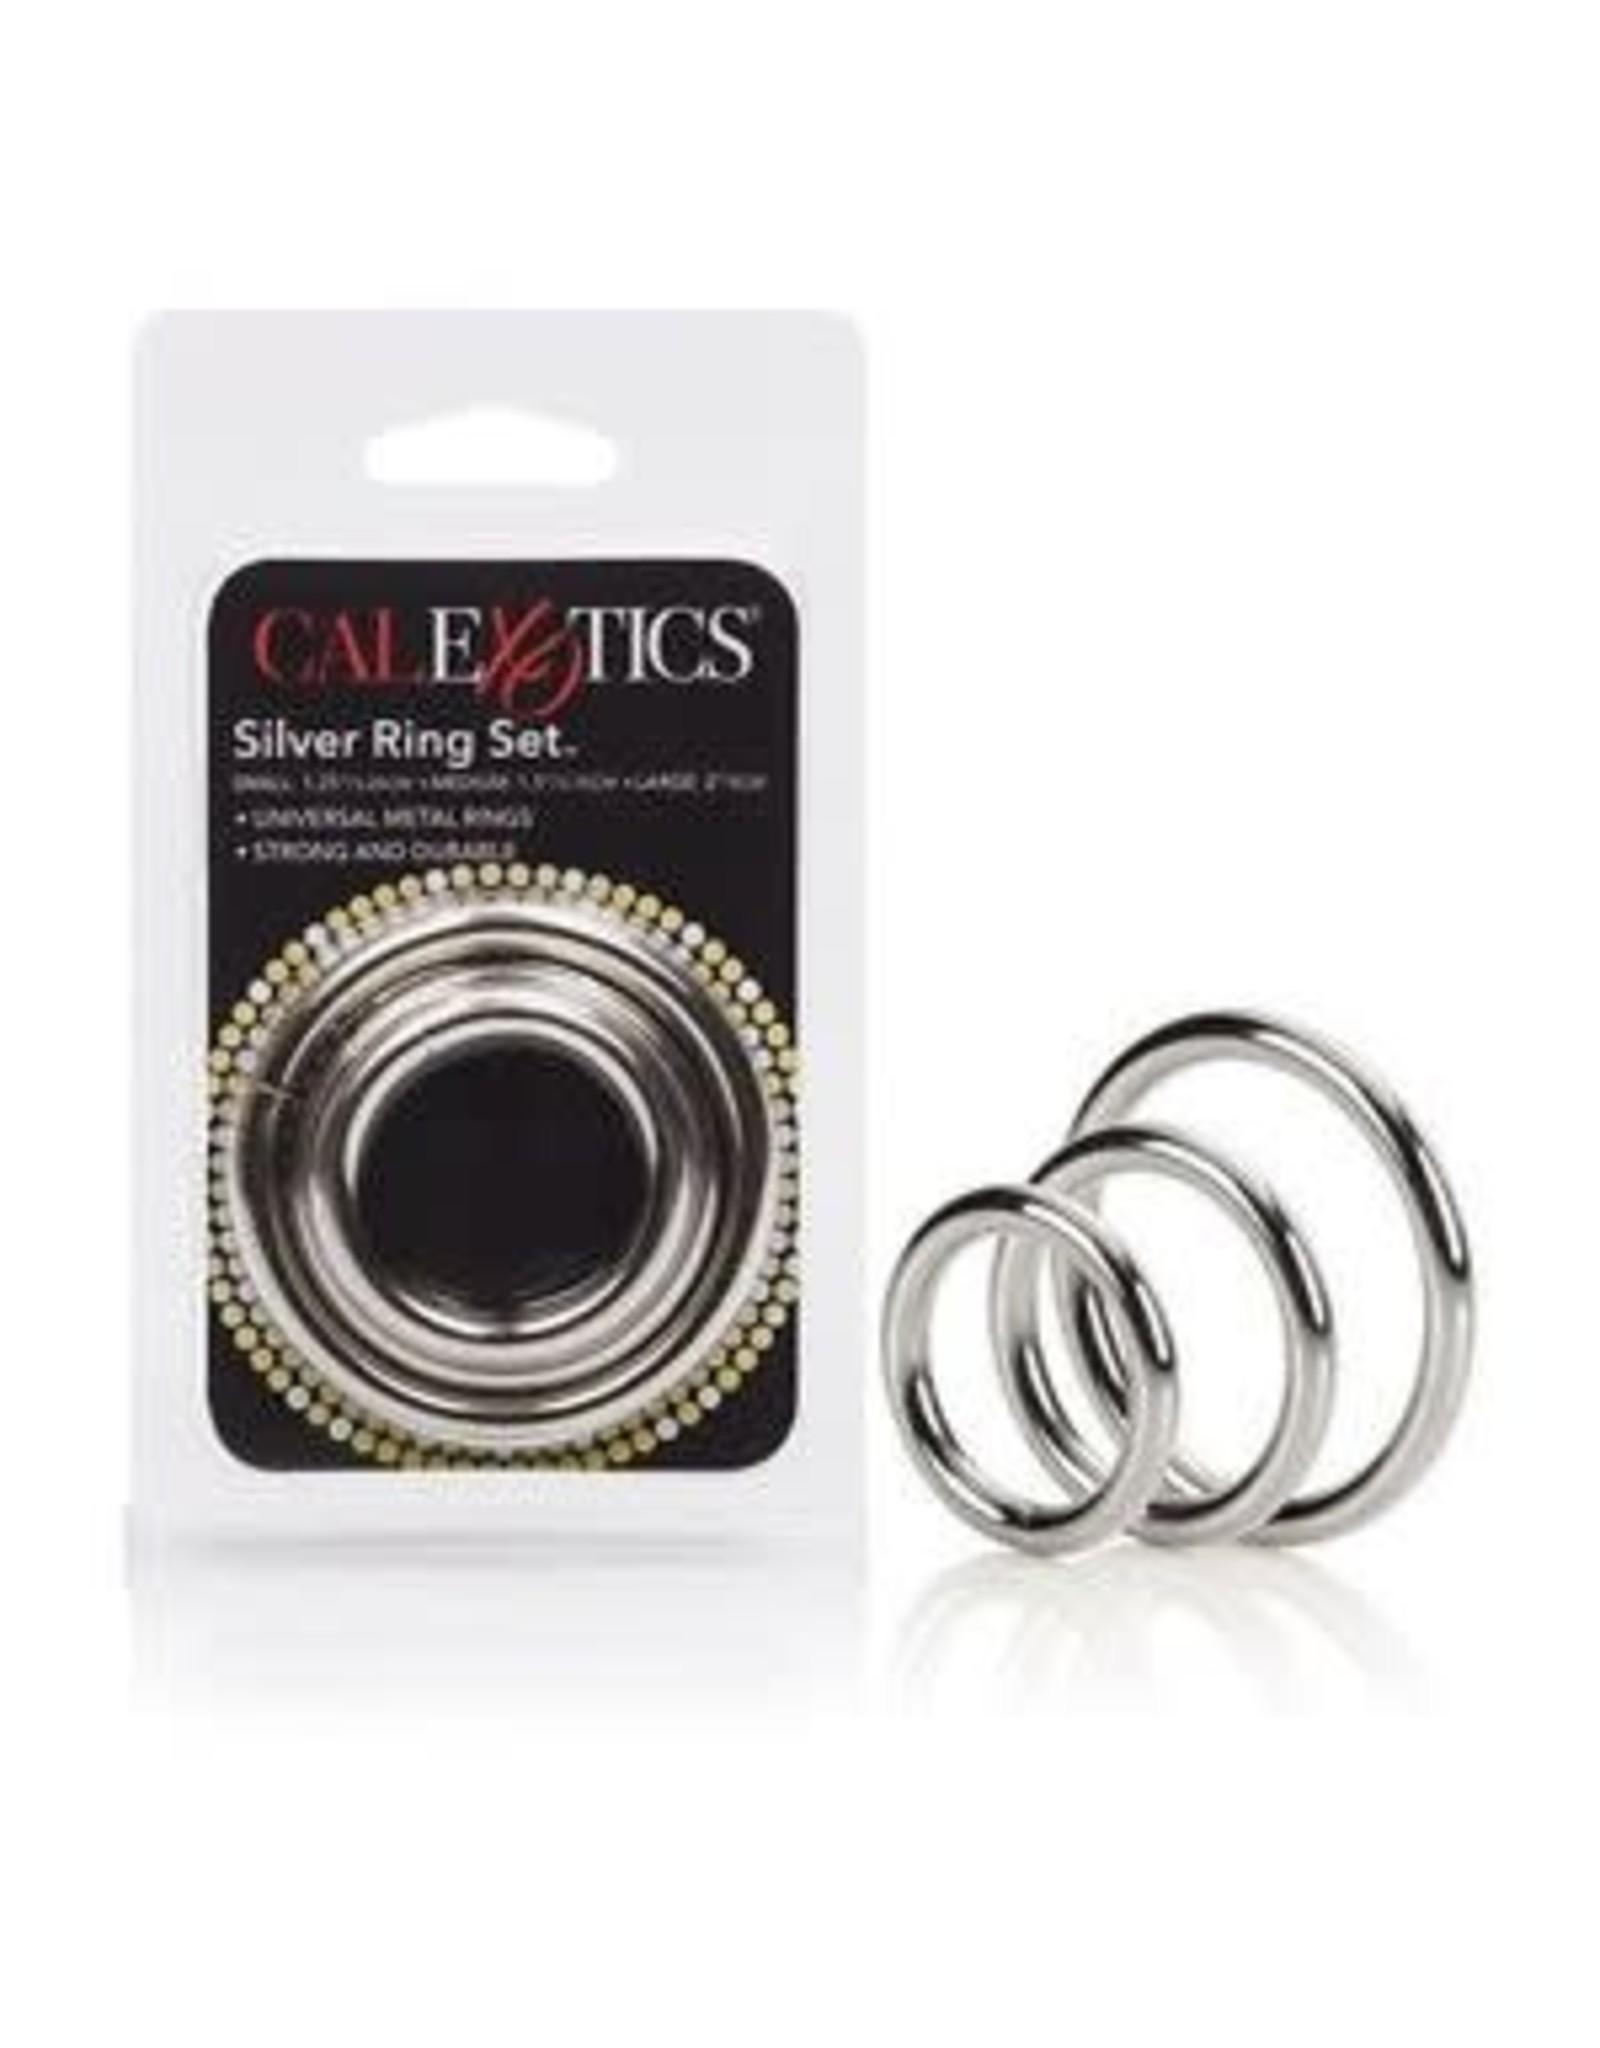 CALEXOTICS - SILVER RING SET - 3 PIECE